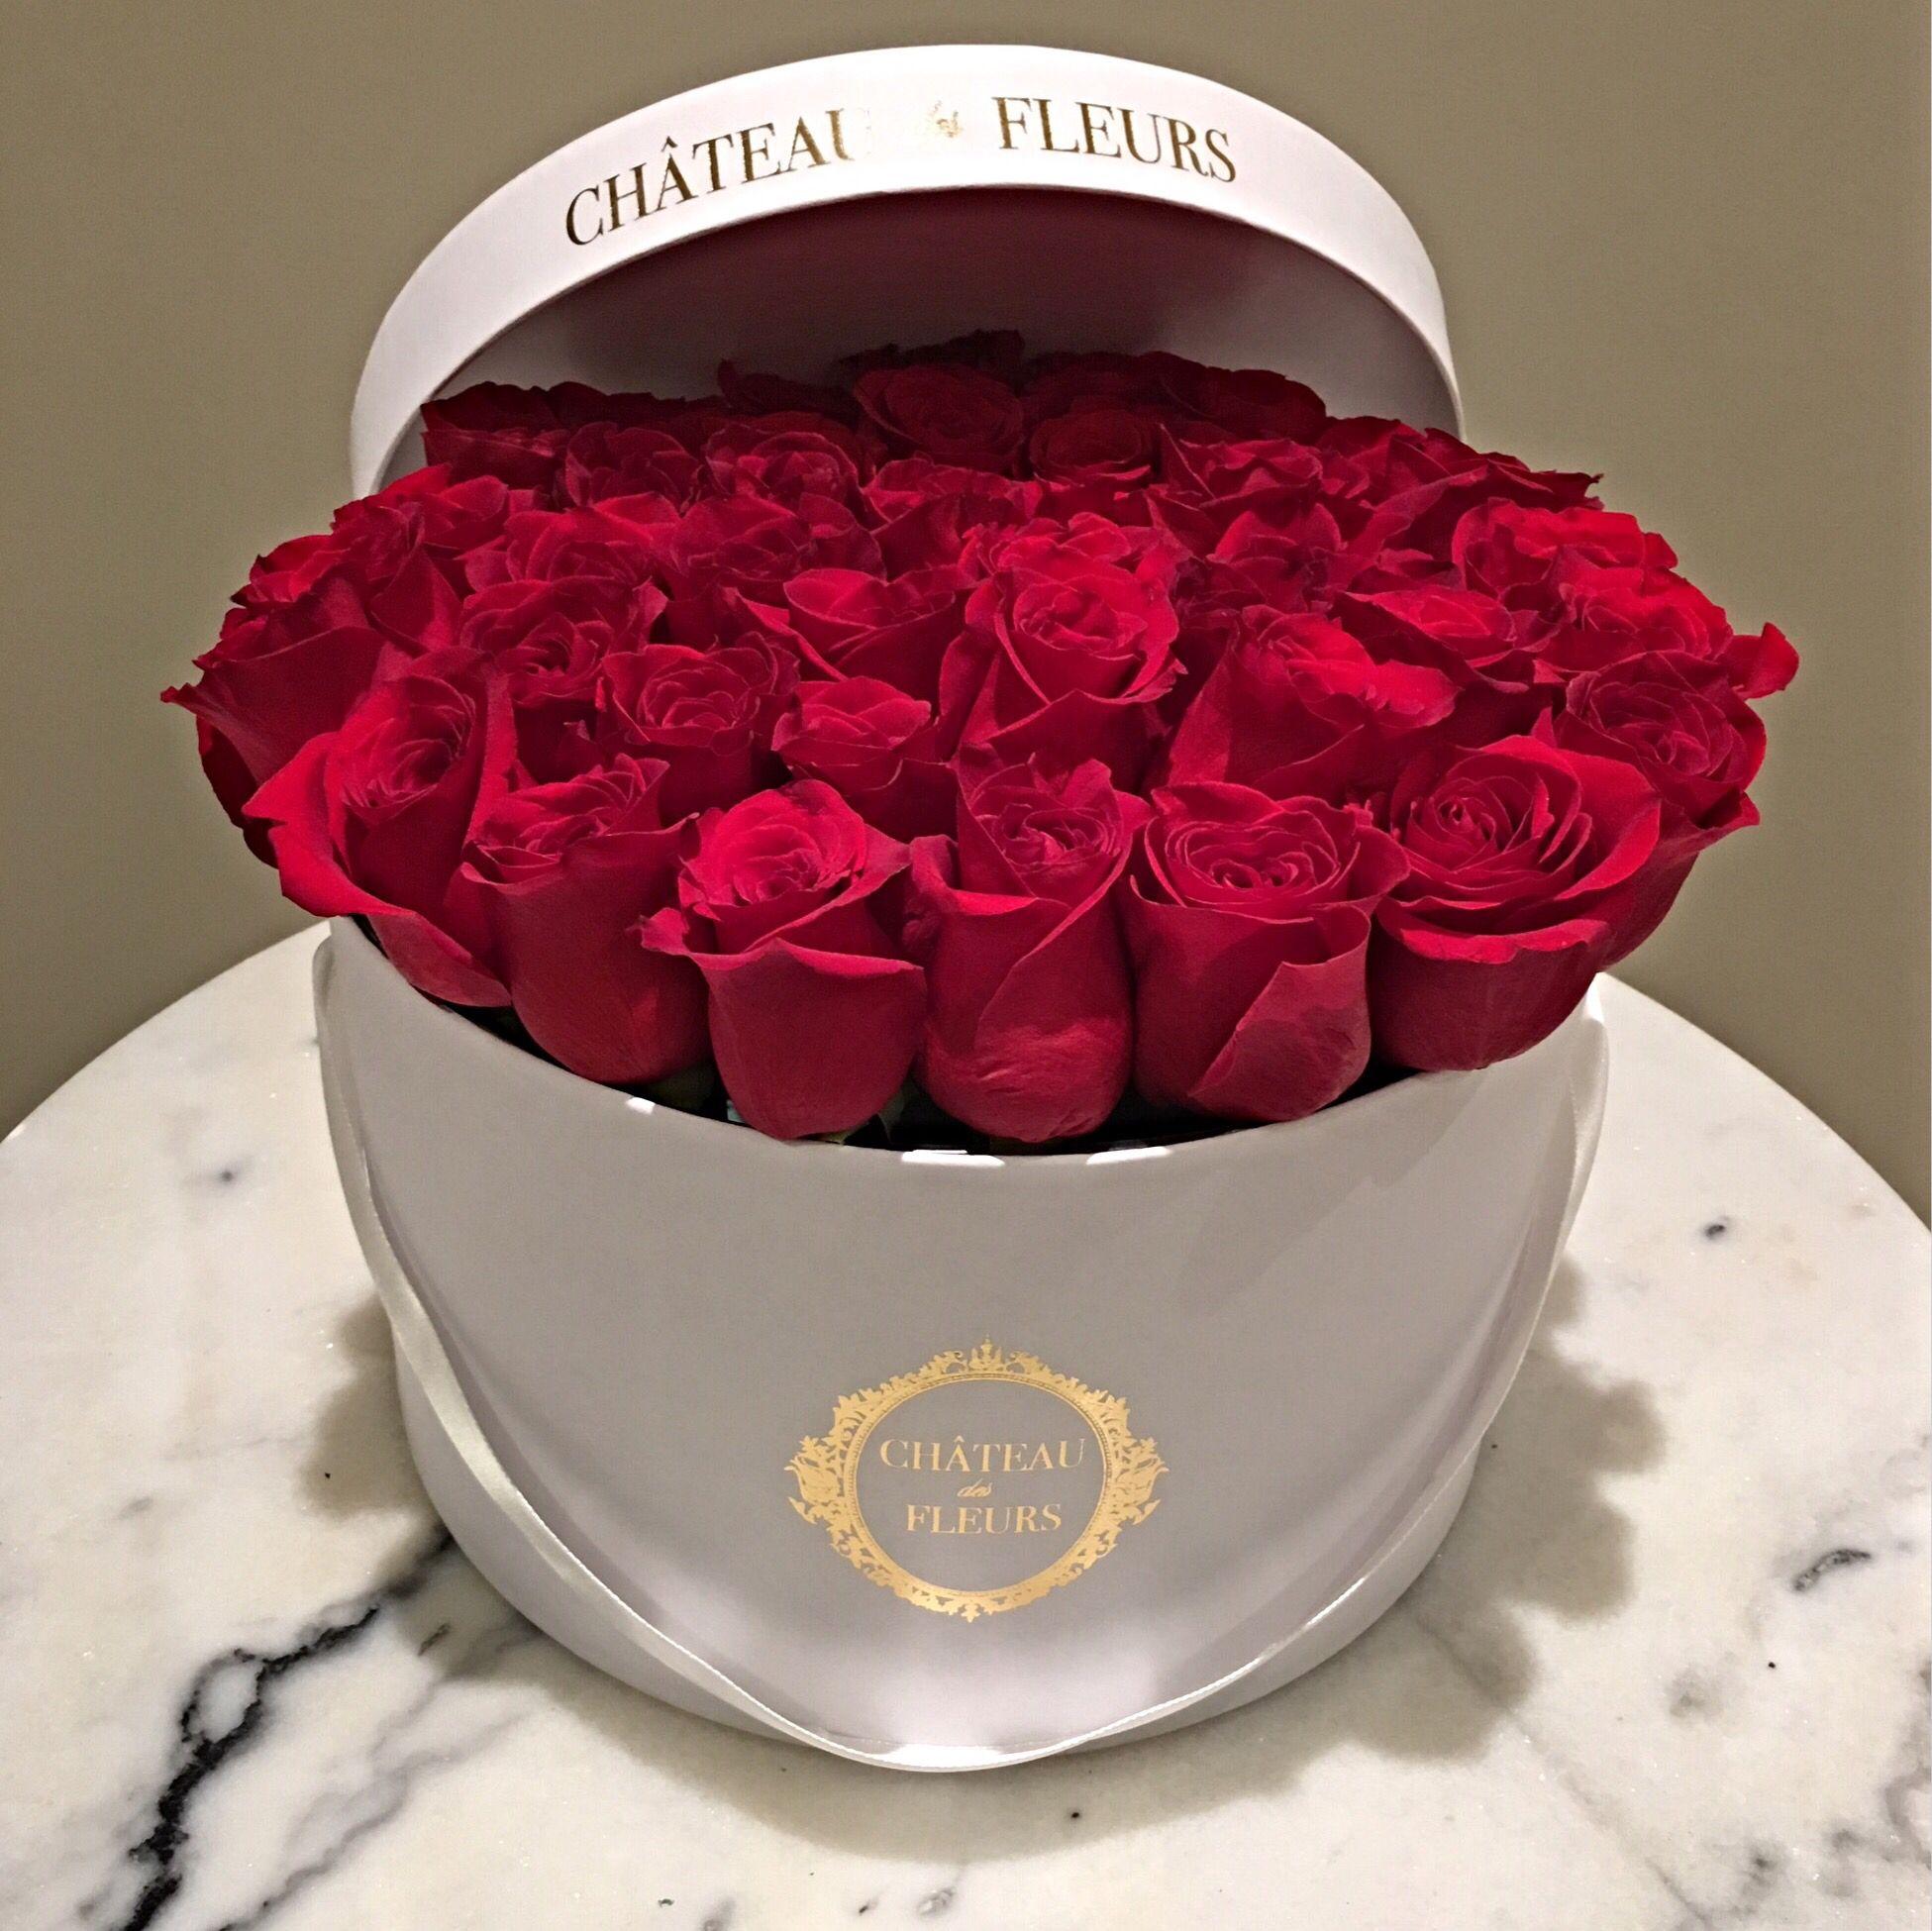 Signature Round Box Chateau Des Fleurs Rose Collection Flowers In A Box Boxed Flowers Flower Roses Luxury Roma Chateau Des Fleurs Fleurs Fleurs Paris